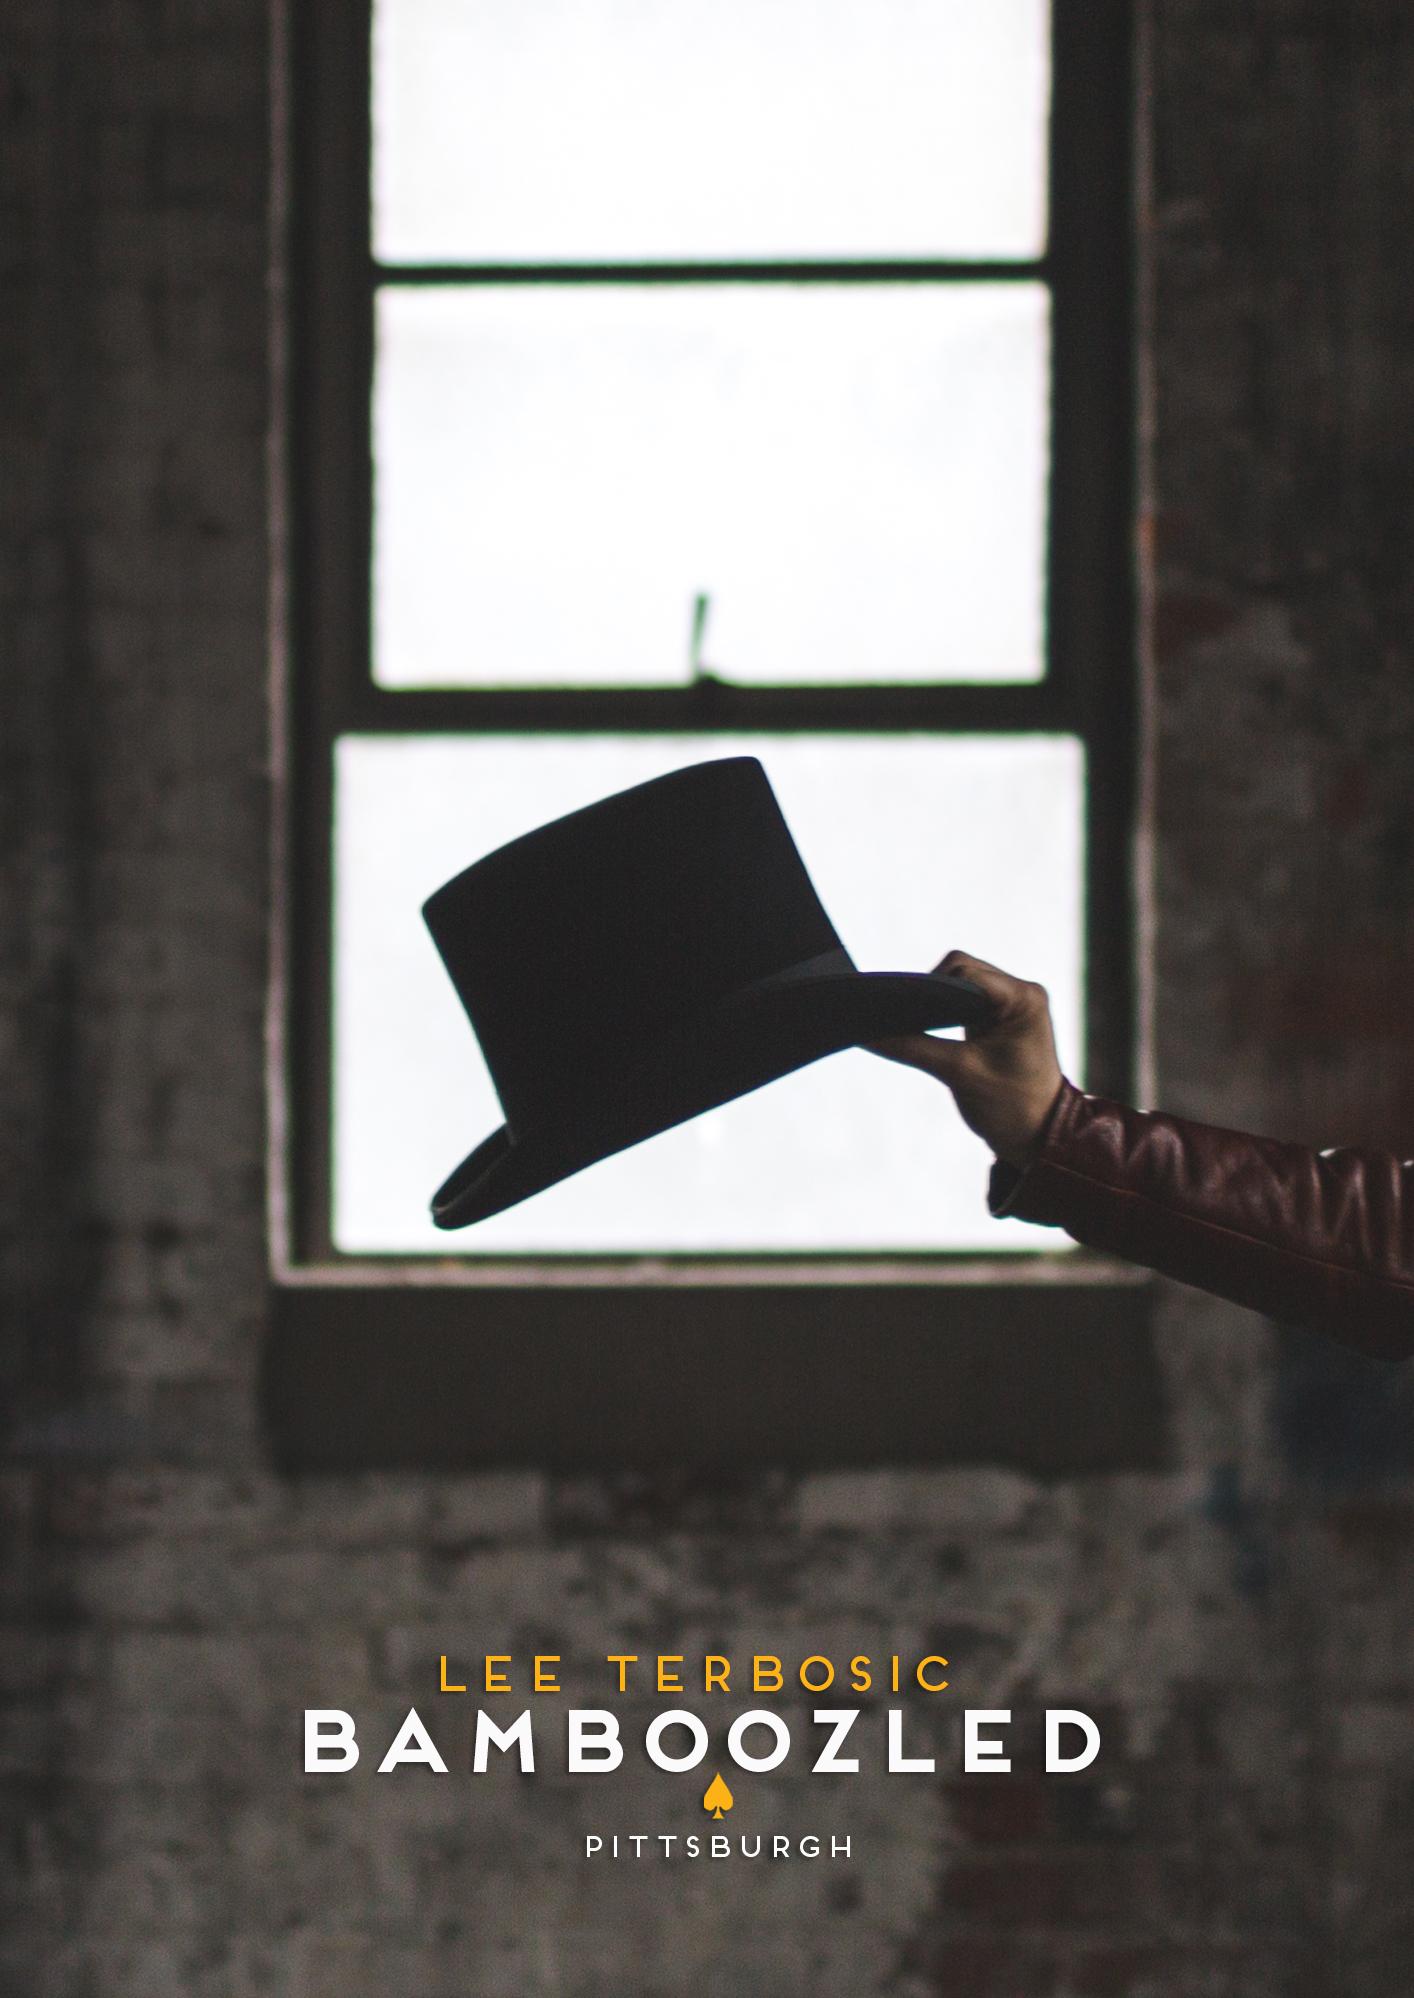 Lee Terbosic-Bamboozled-Image & Logo-8.jpg